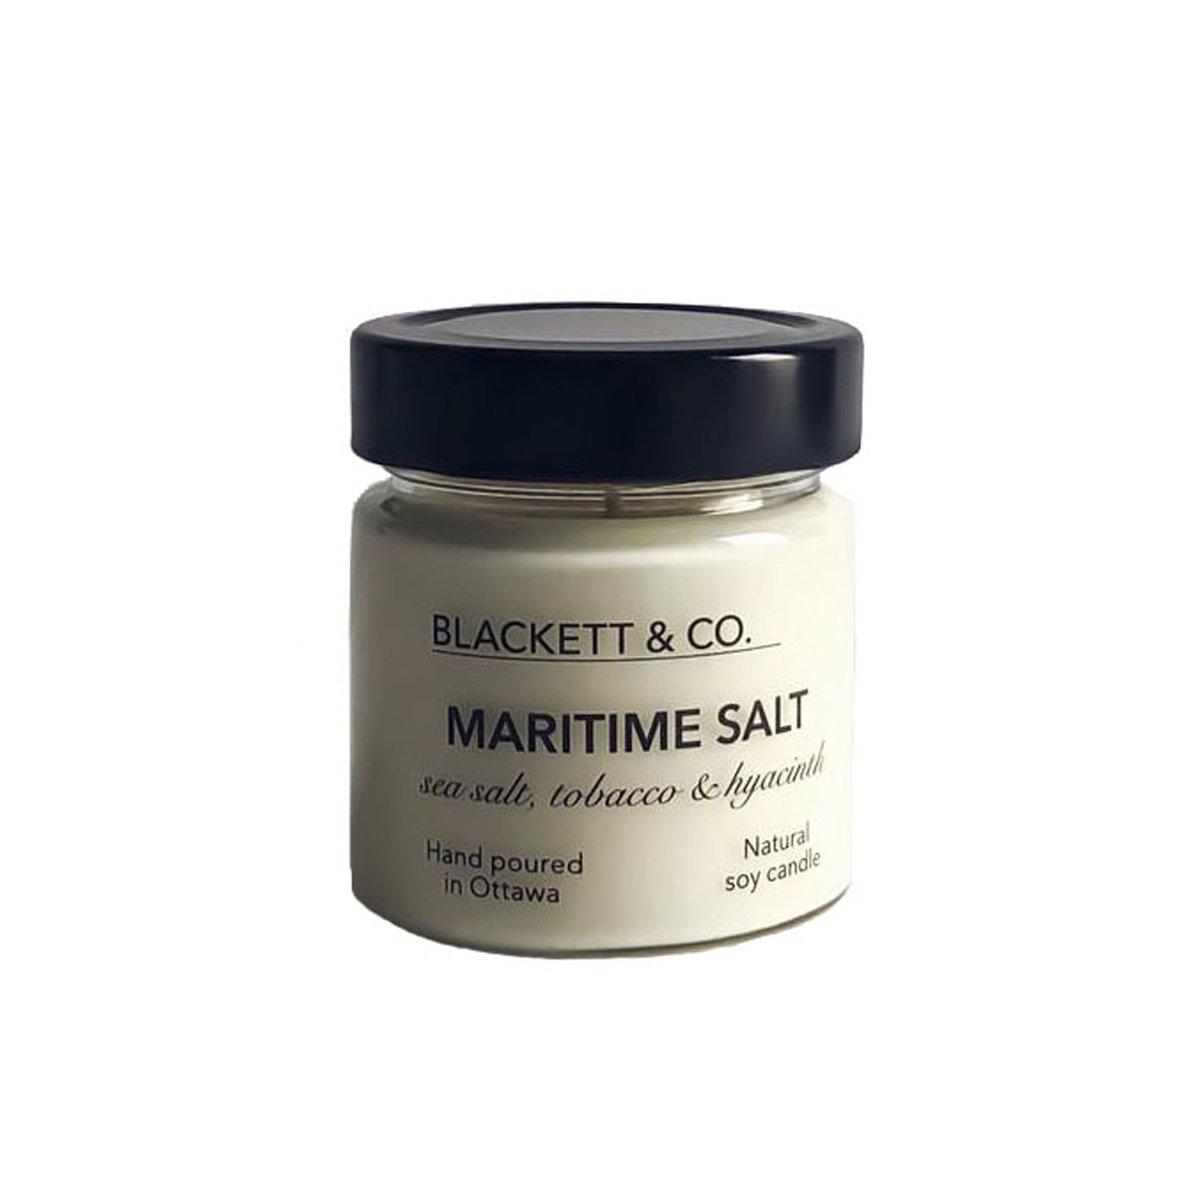 maritimesalt_1200x.jpg